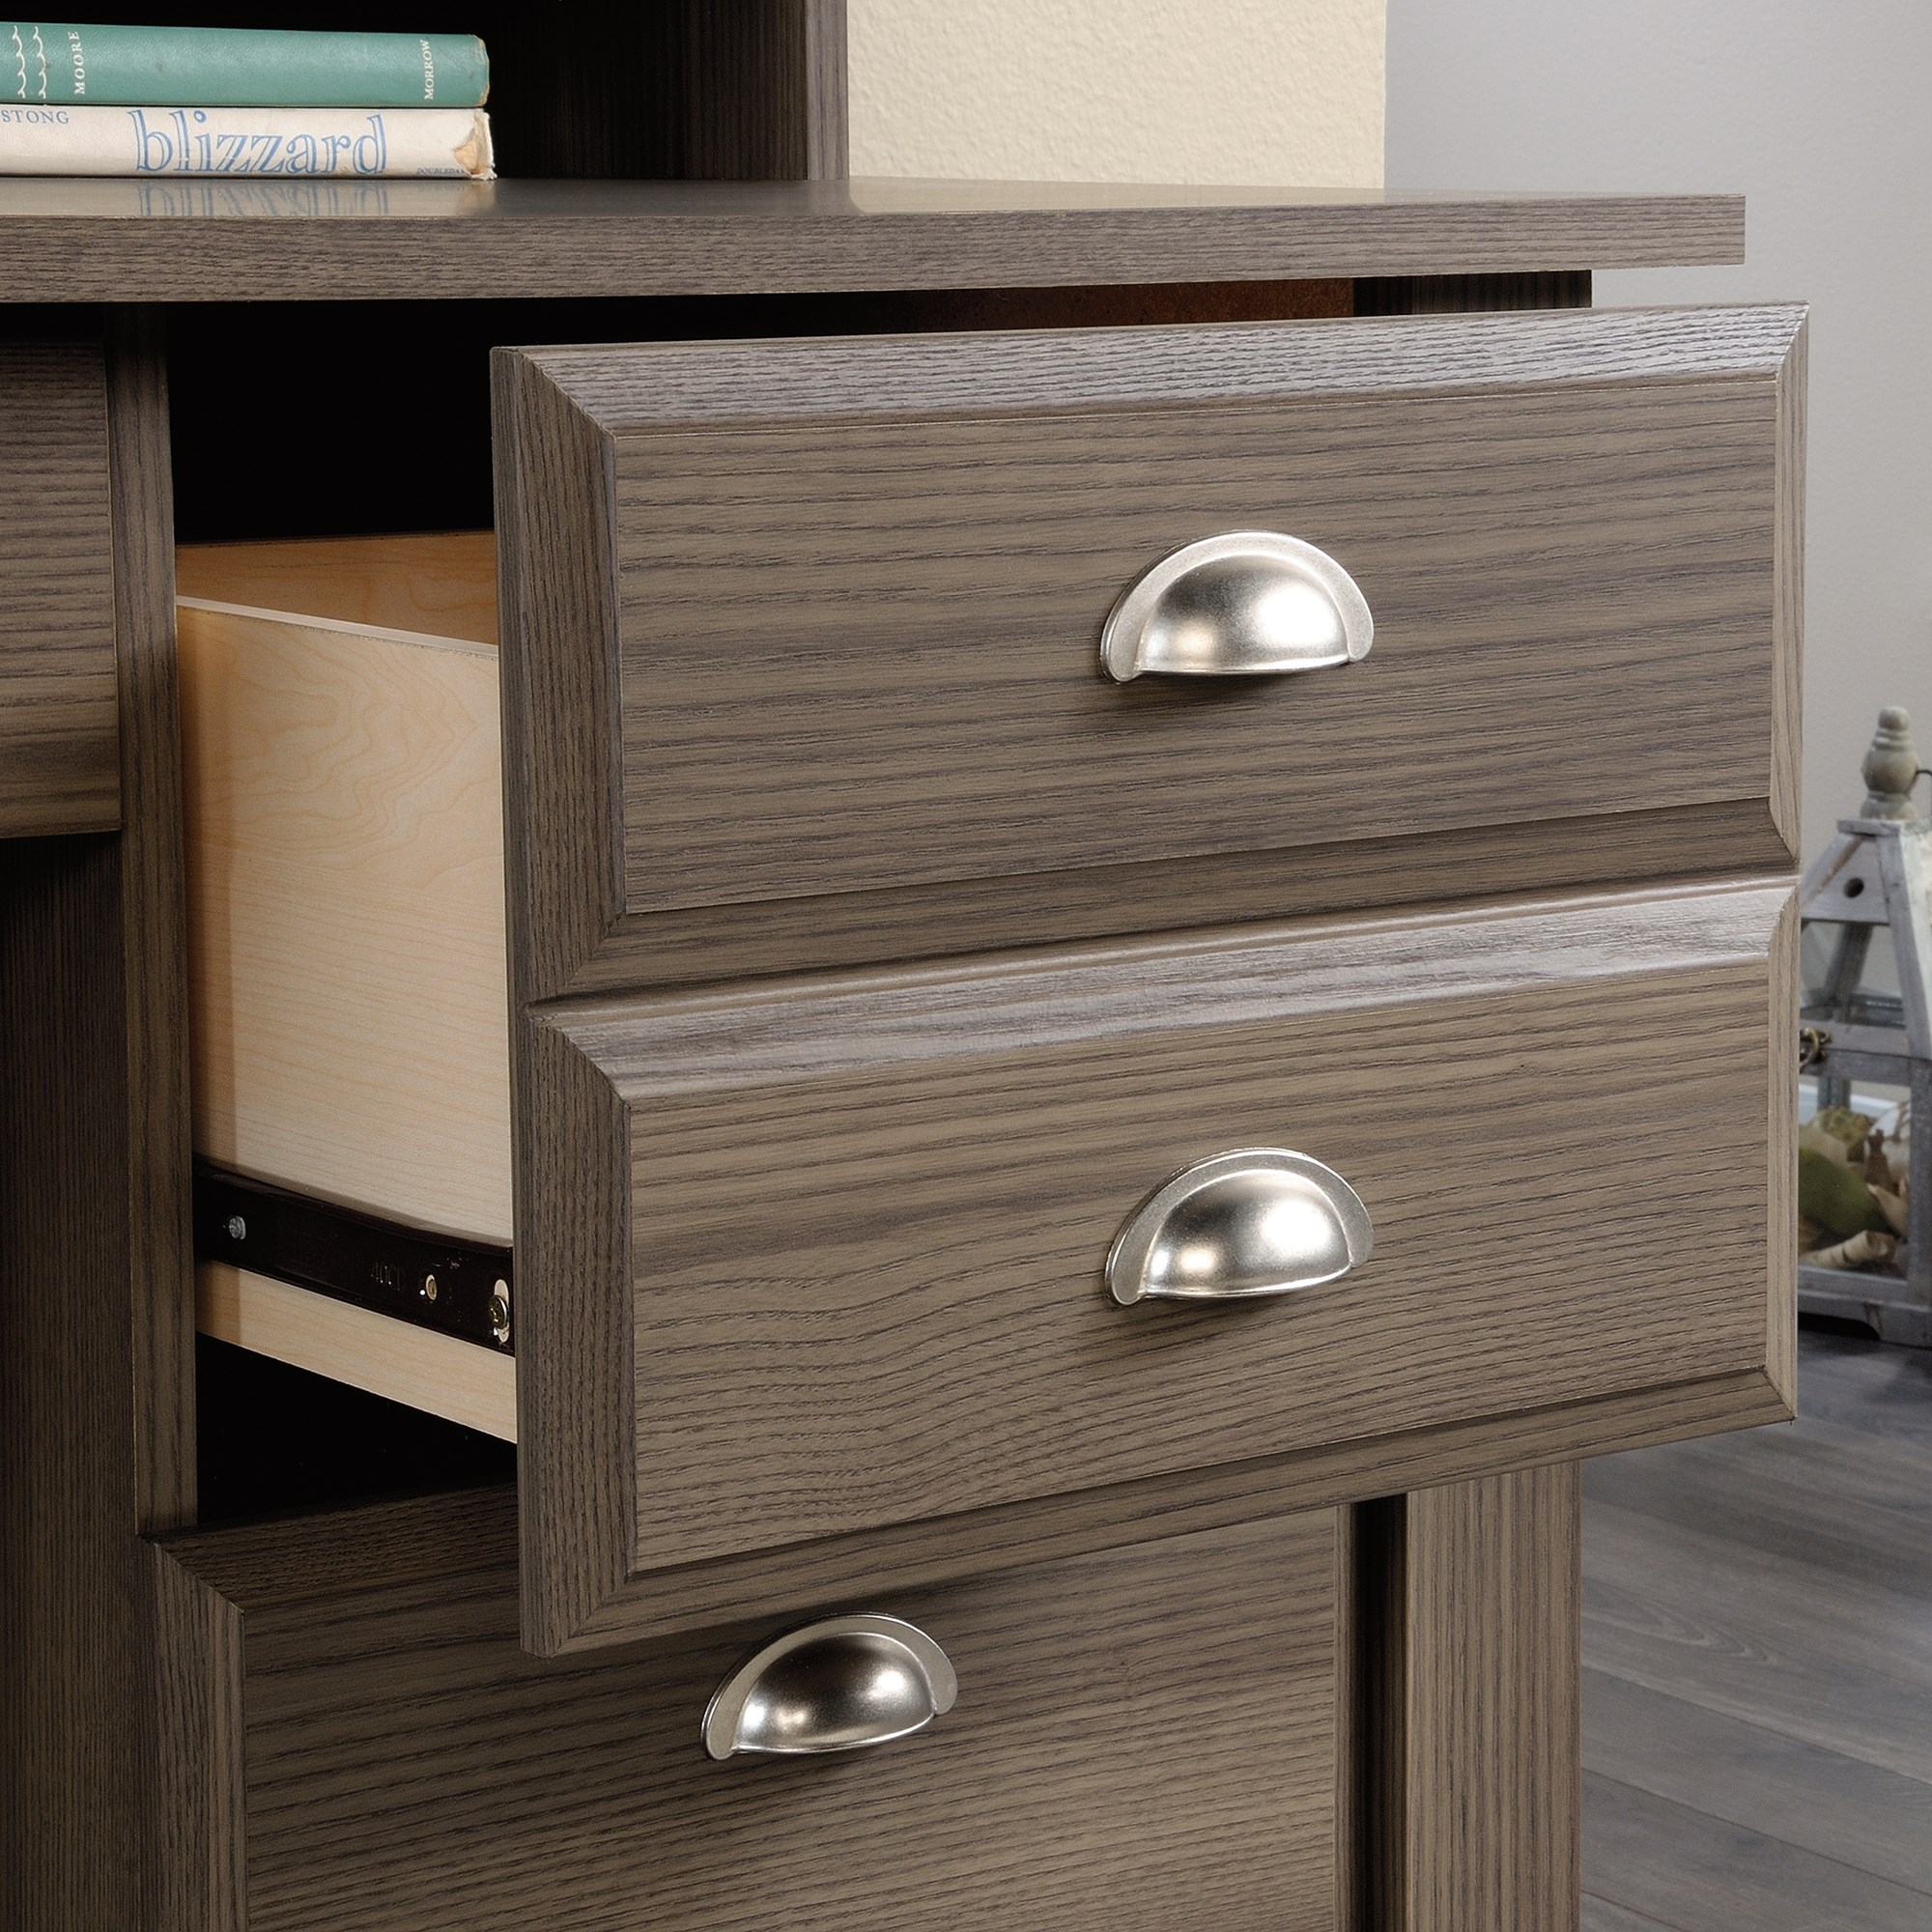 Levitz Furniture Stores: Sauder Shoal Creek 418657 Desk With Keyboard Drawer